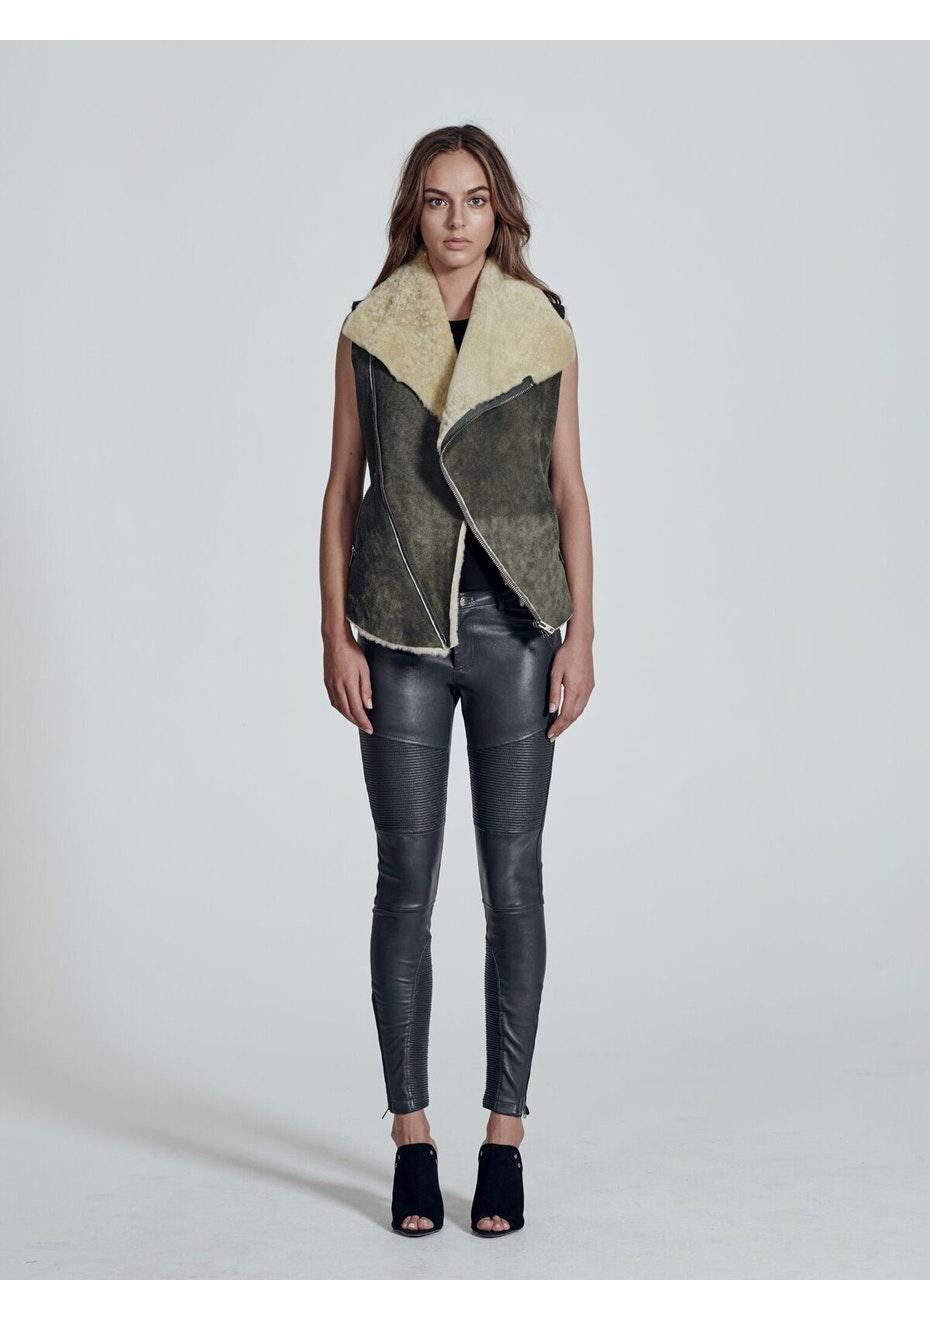 West 14th - Nolita Drape Vest - Distressed Grey